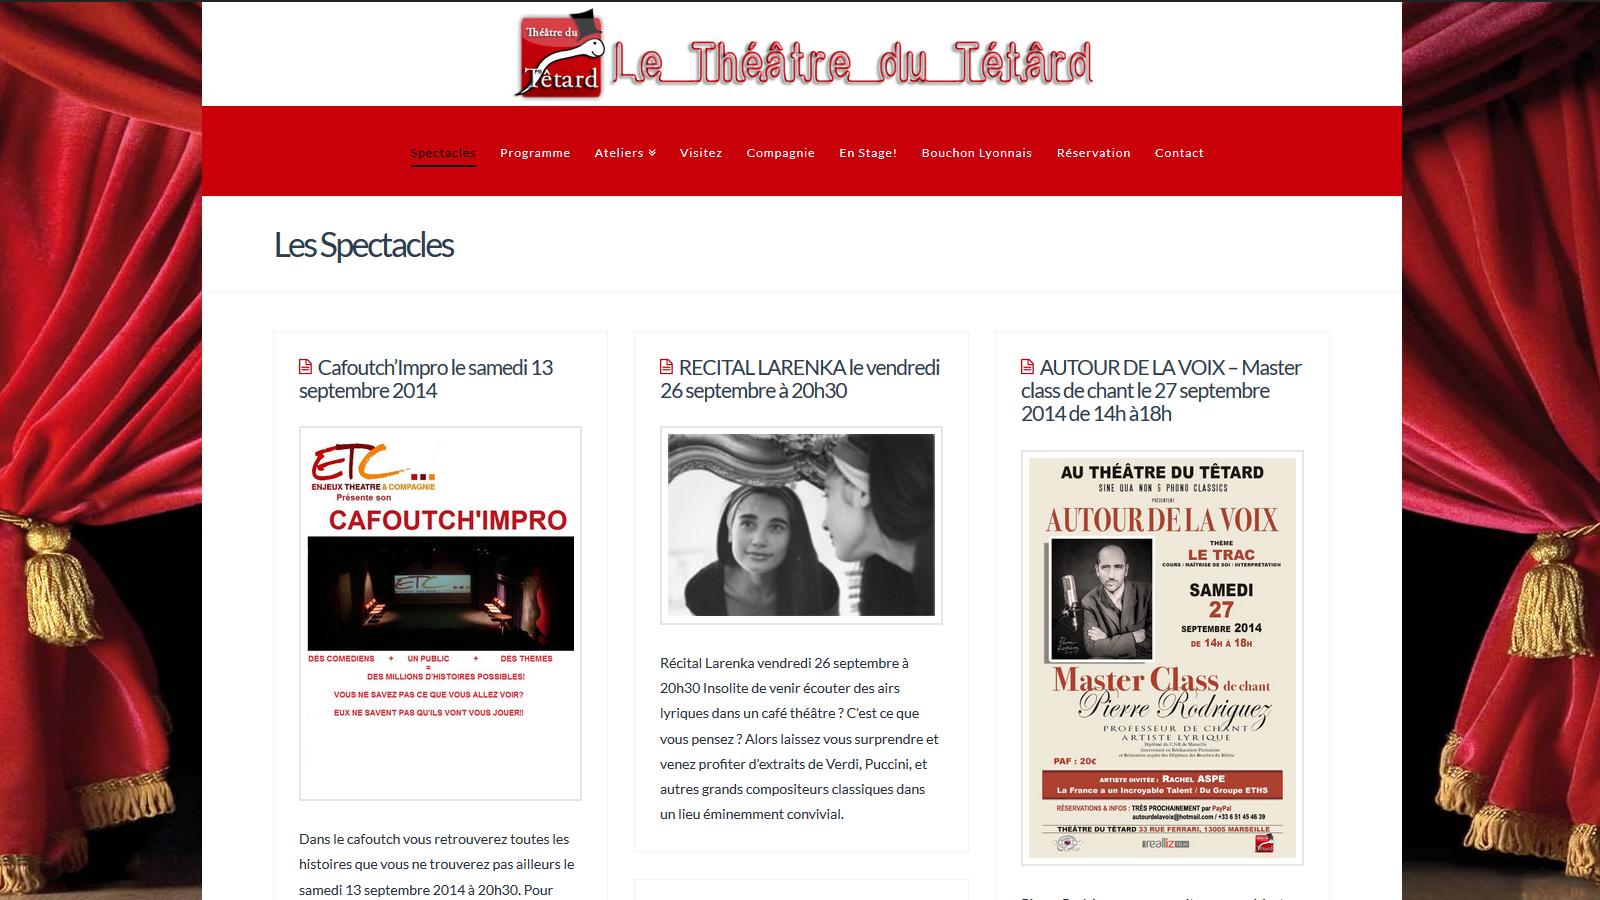 creation-site-internet-marseille-cafe-theatre-marseille-plaine-13005-marseille-le-tetard